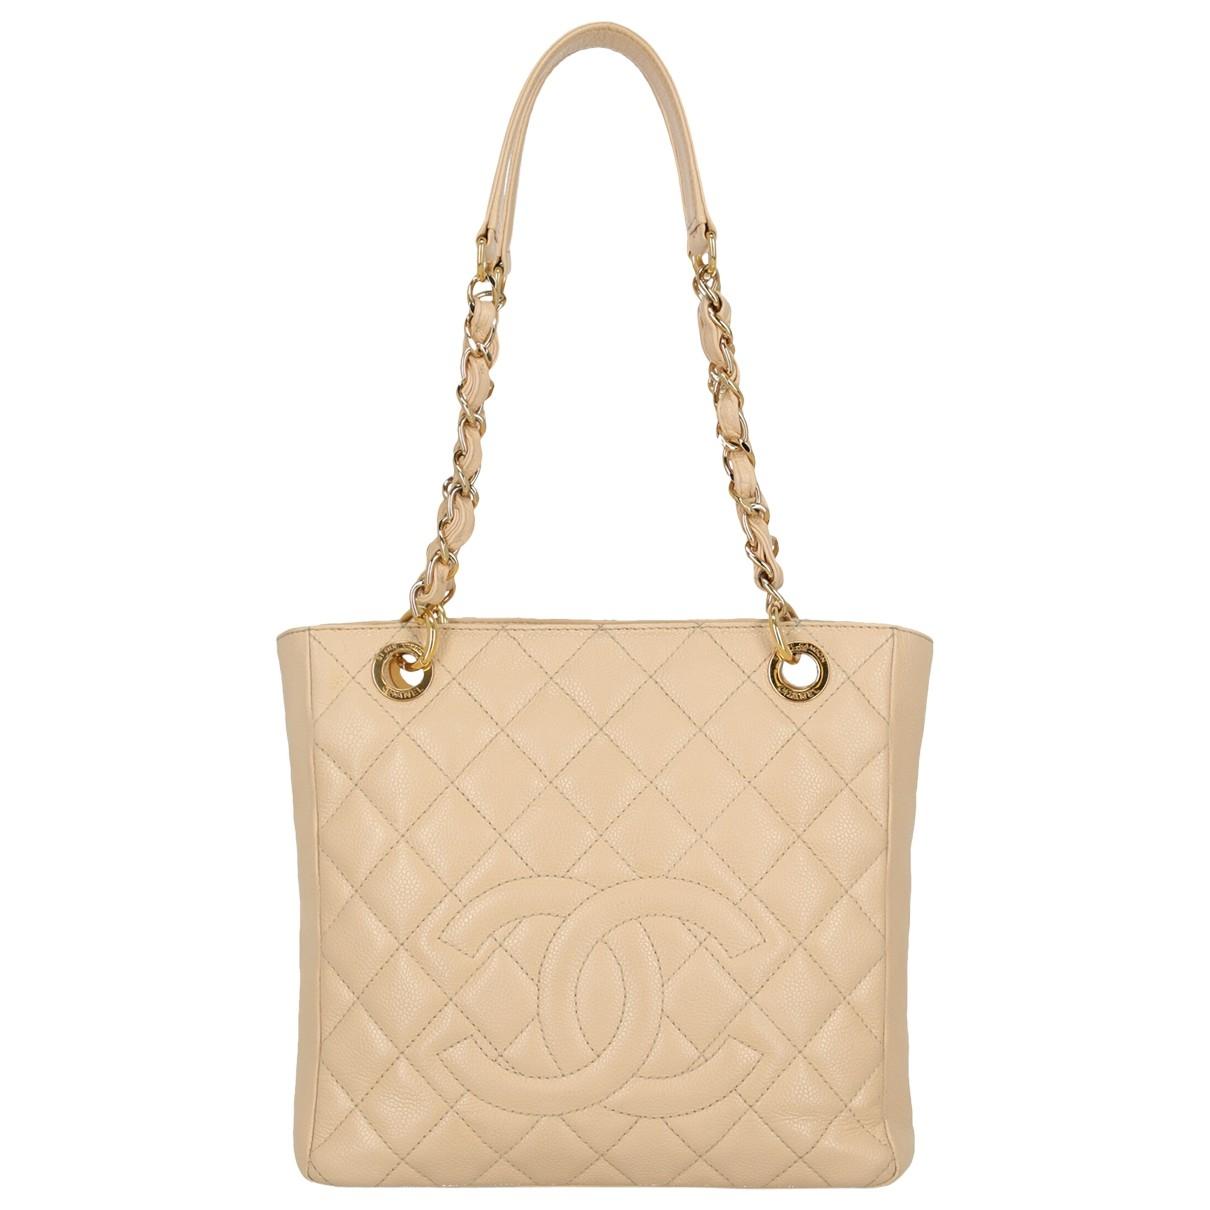 Chanel Petite Shopping Tote Beige Leather handbag for Women \N